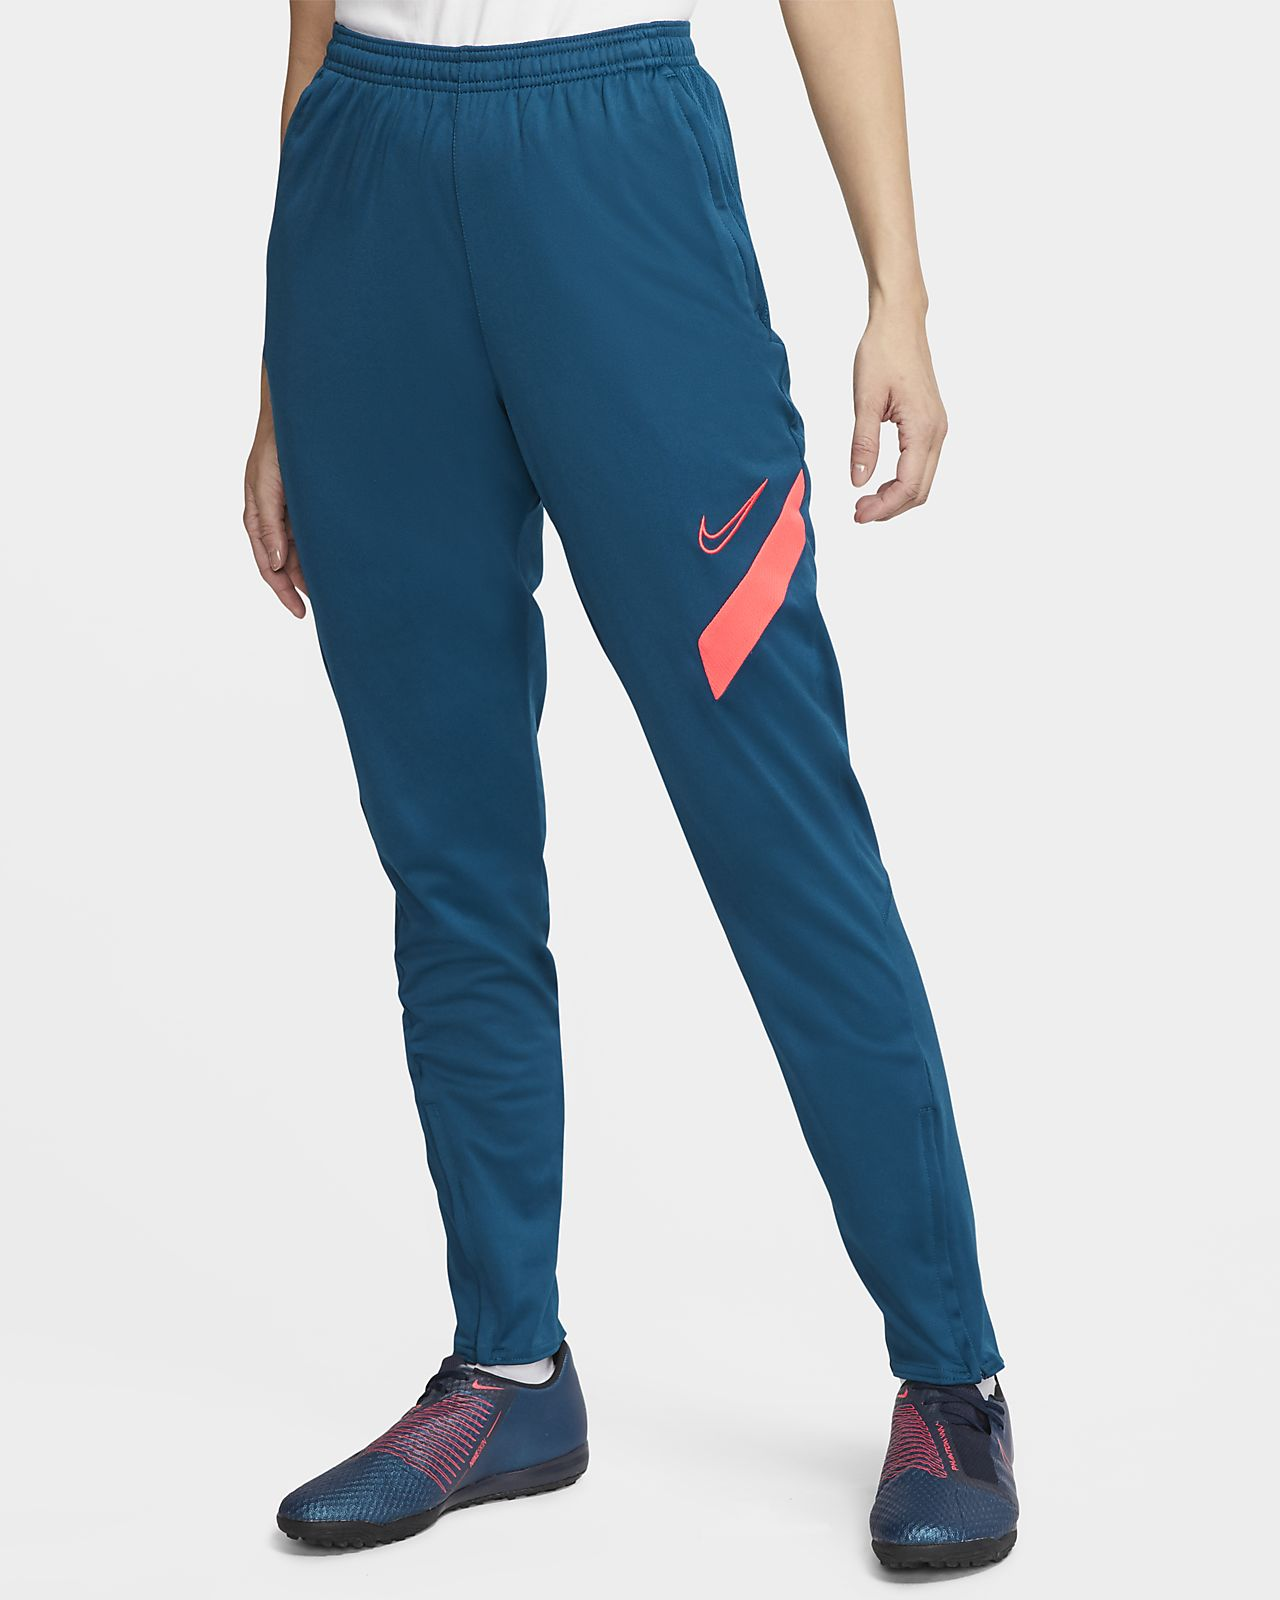 Nike Dri-FIT Academy Pro Damen-Fußballhose